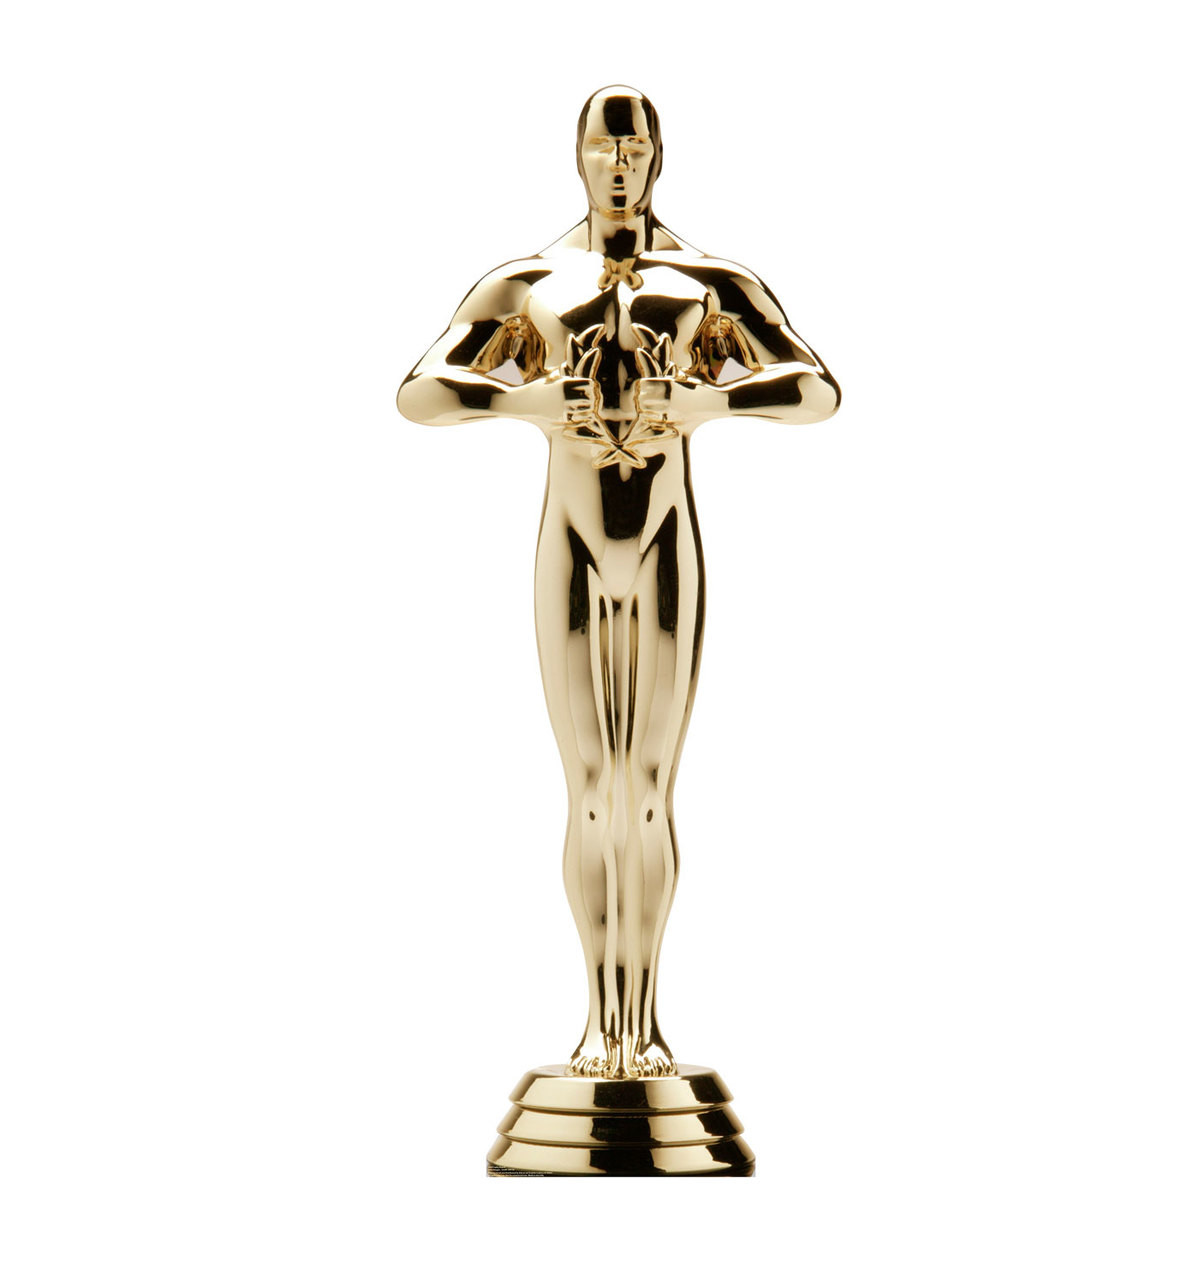 Trophy Award-Cardboard Cutout 2480